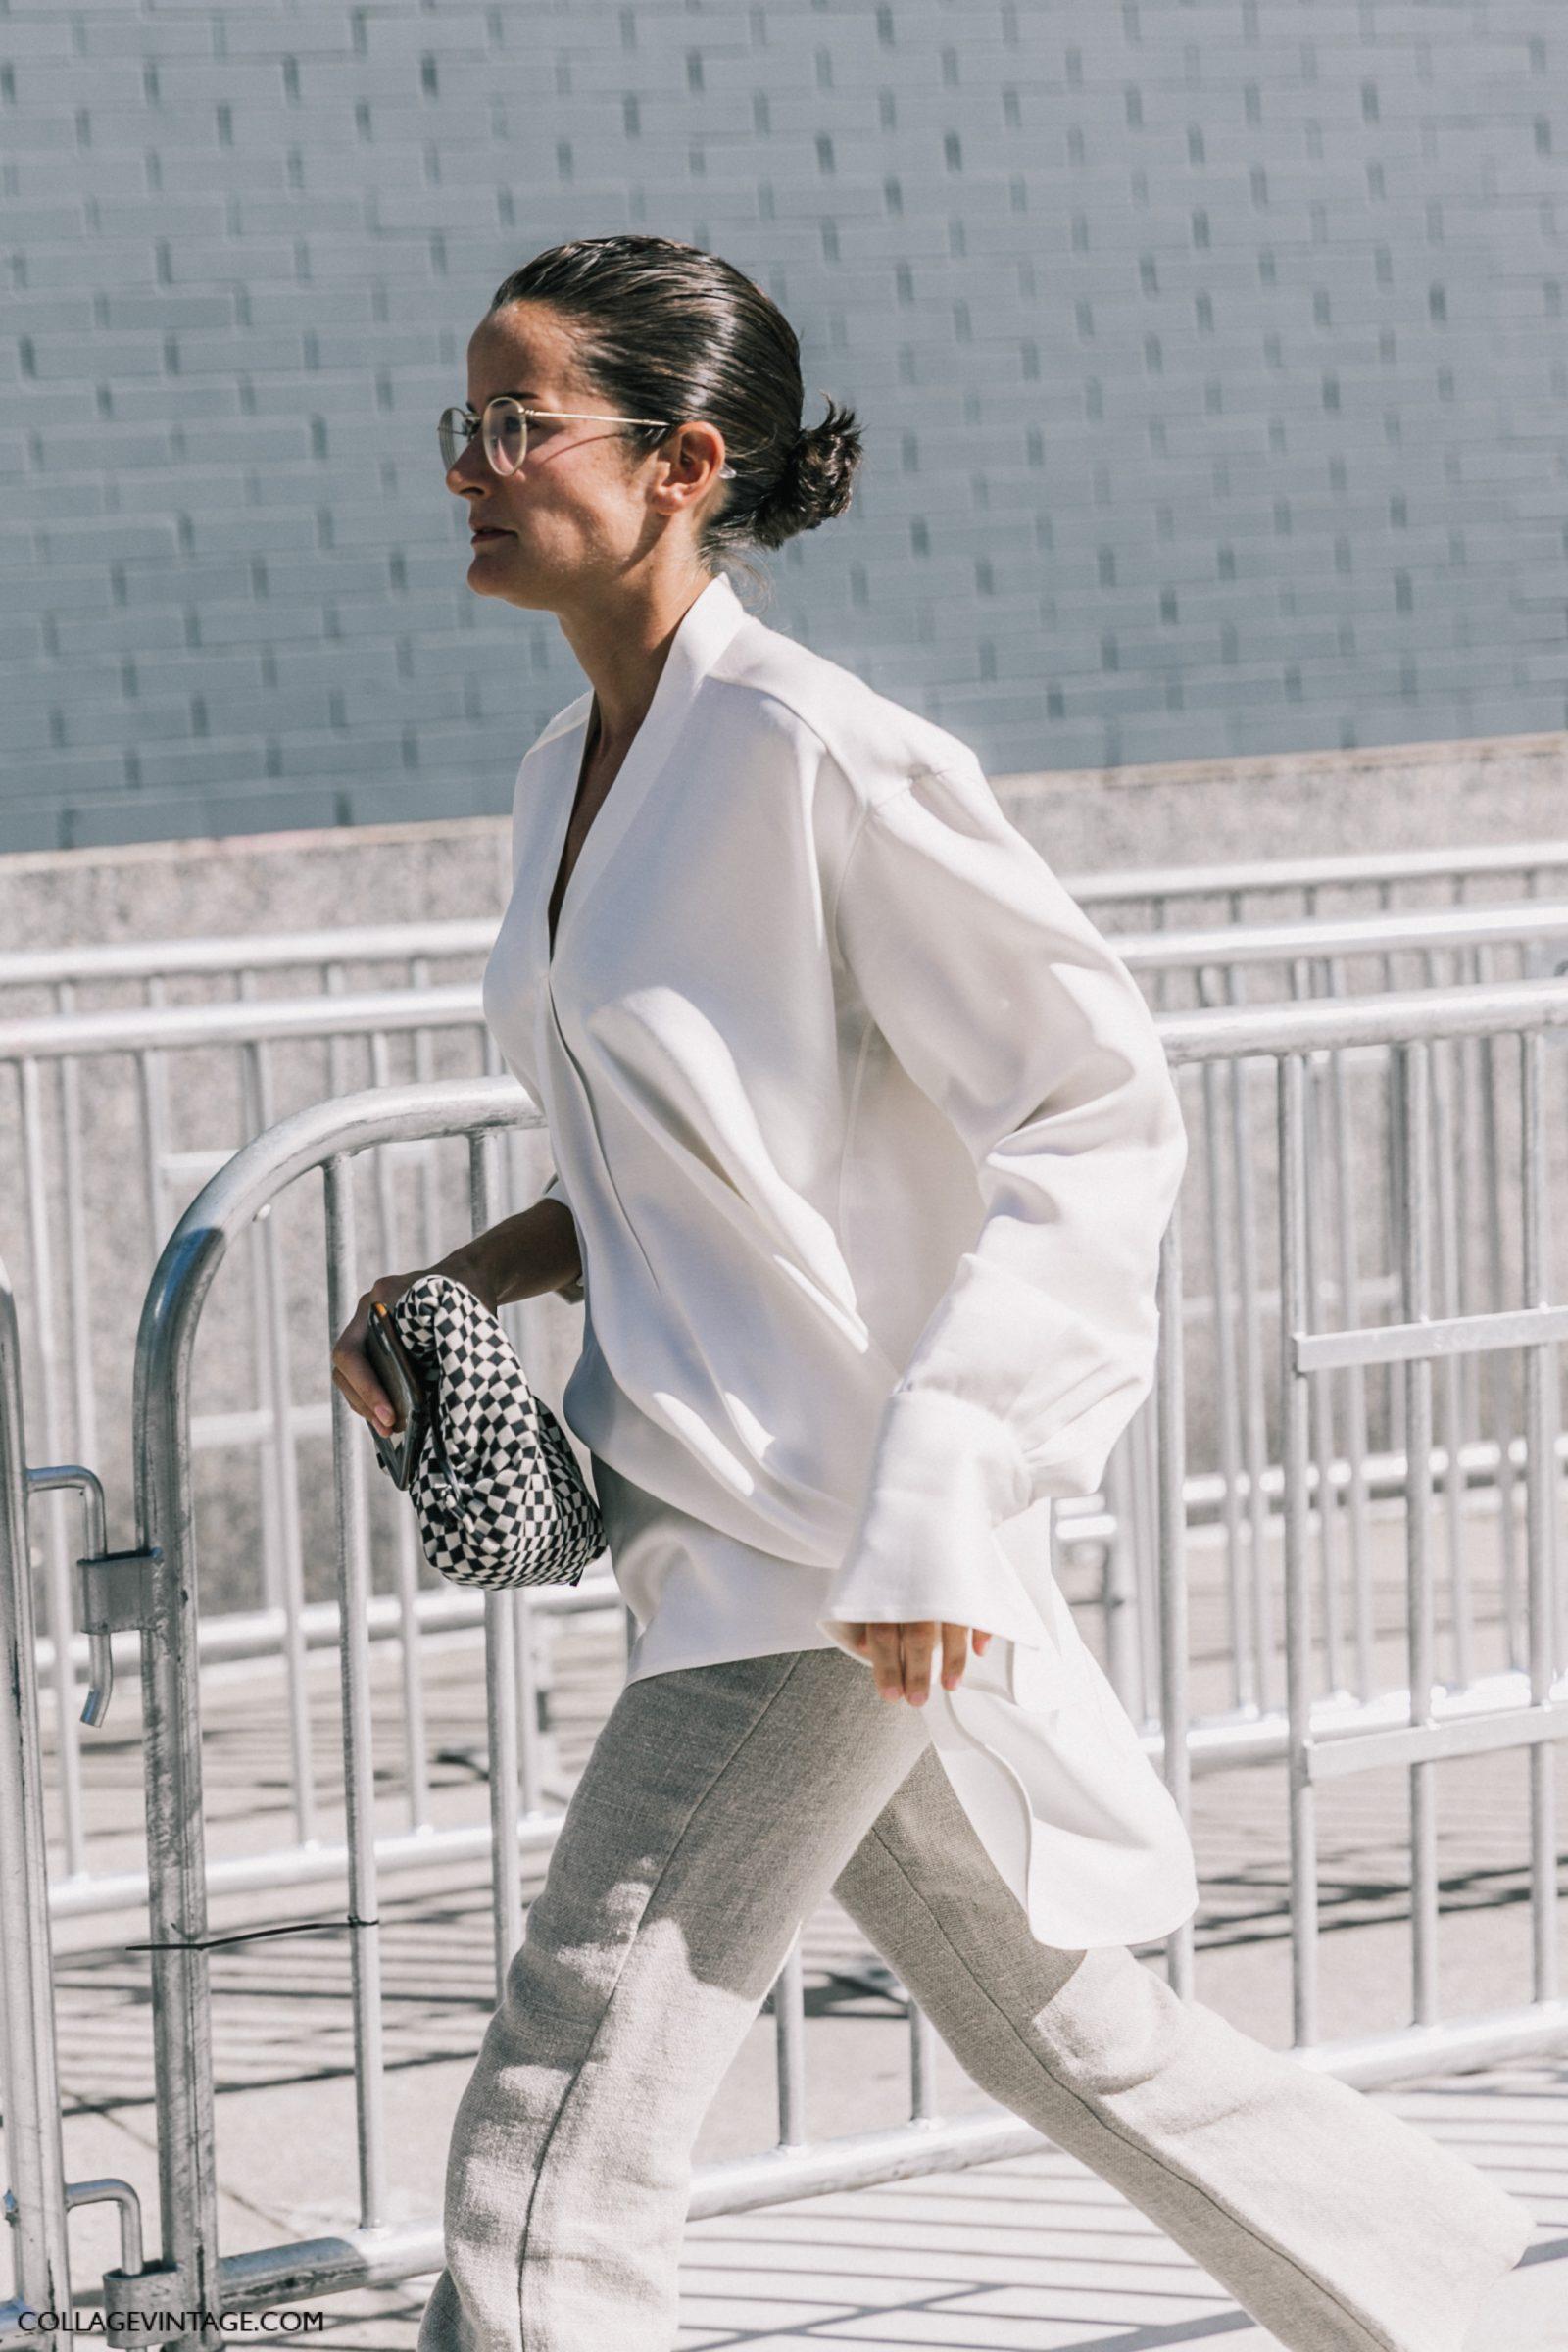 nyfw-new_york_fashion_week_ss17-street_style-outfits-collage_vintage-vintage-atuzarra-24